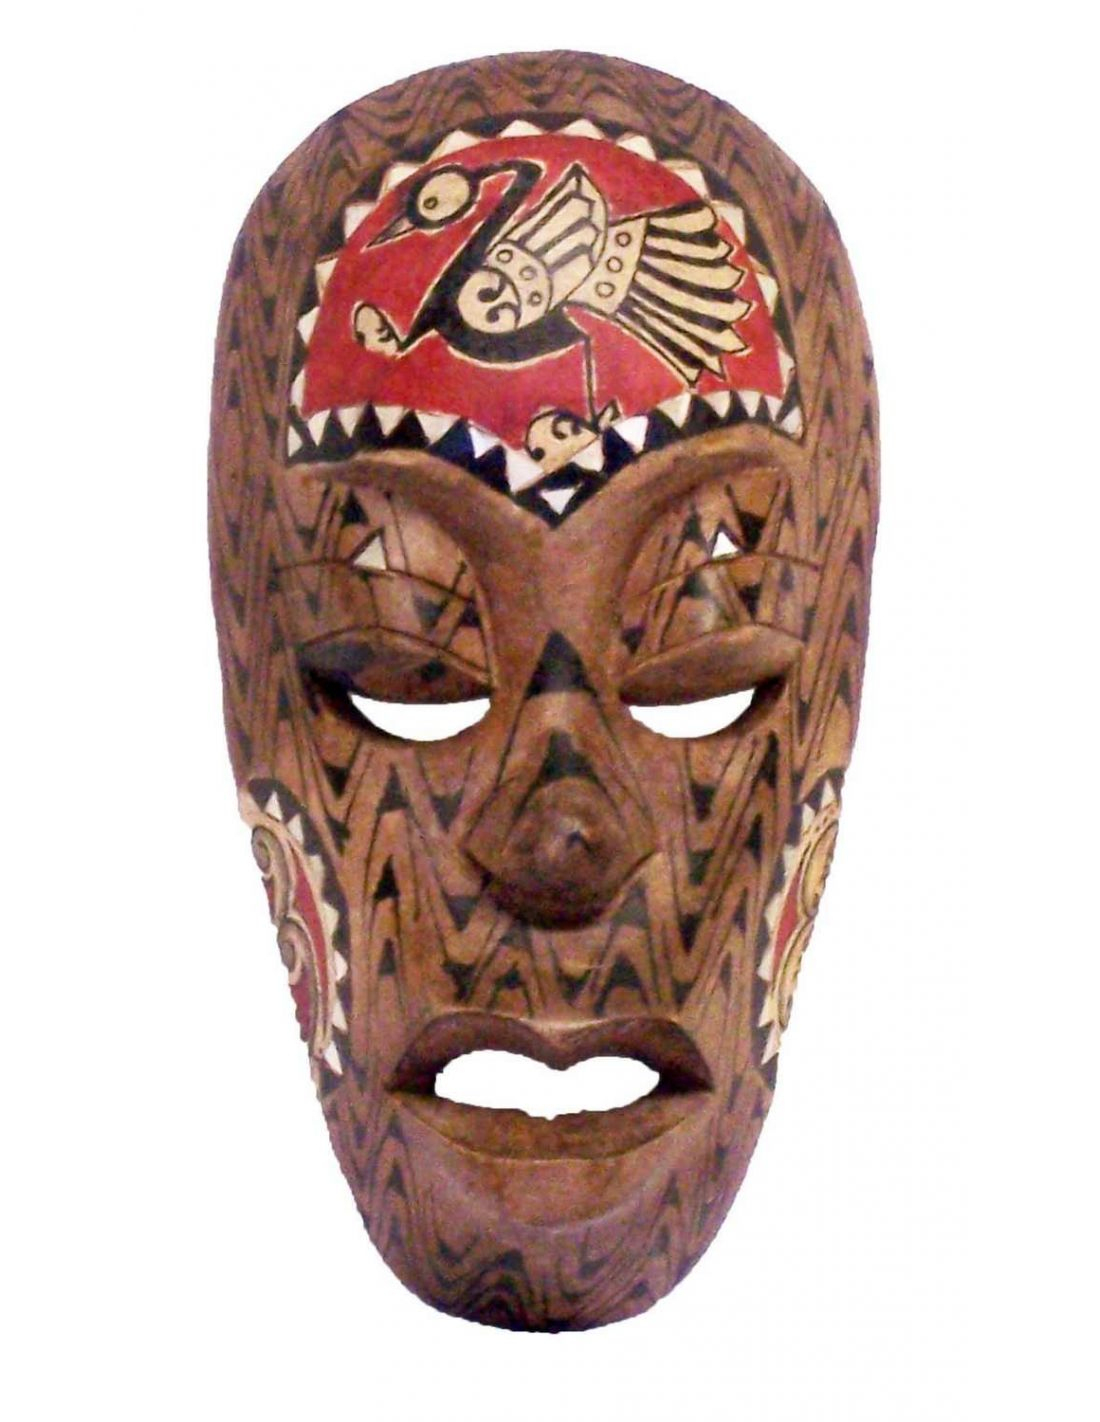 Masque Africain 20 Cm Lombok avec Masque Afriquain